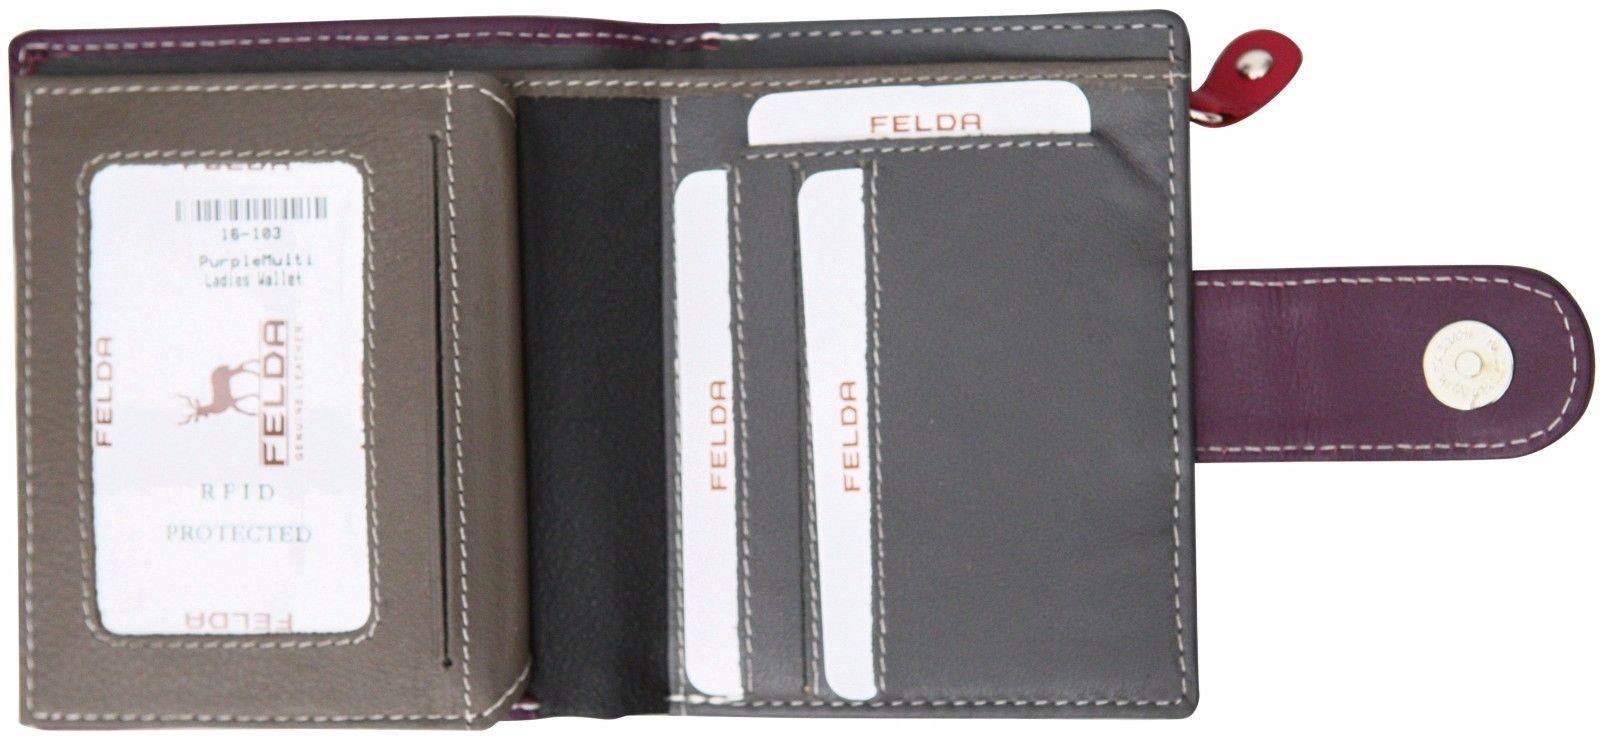 Felda-RFID-onorevoli-MEDAGLIA-amp-Card-Purse-Wallet-Genuine-Leather-Multi-SOFT-BOX-REGALO miniatura 96